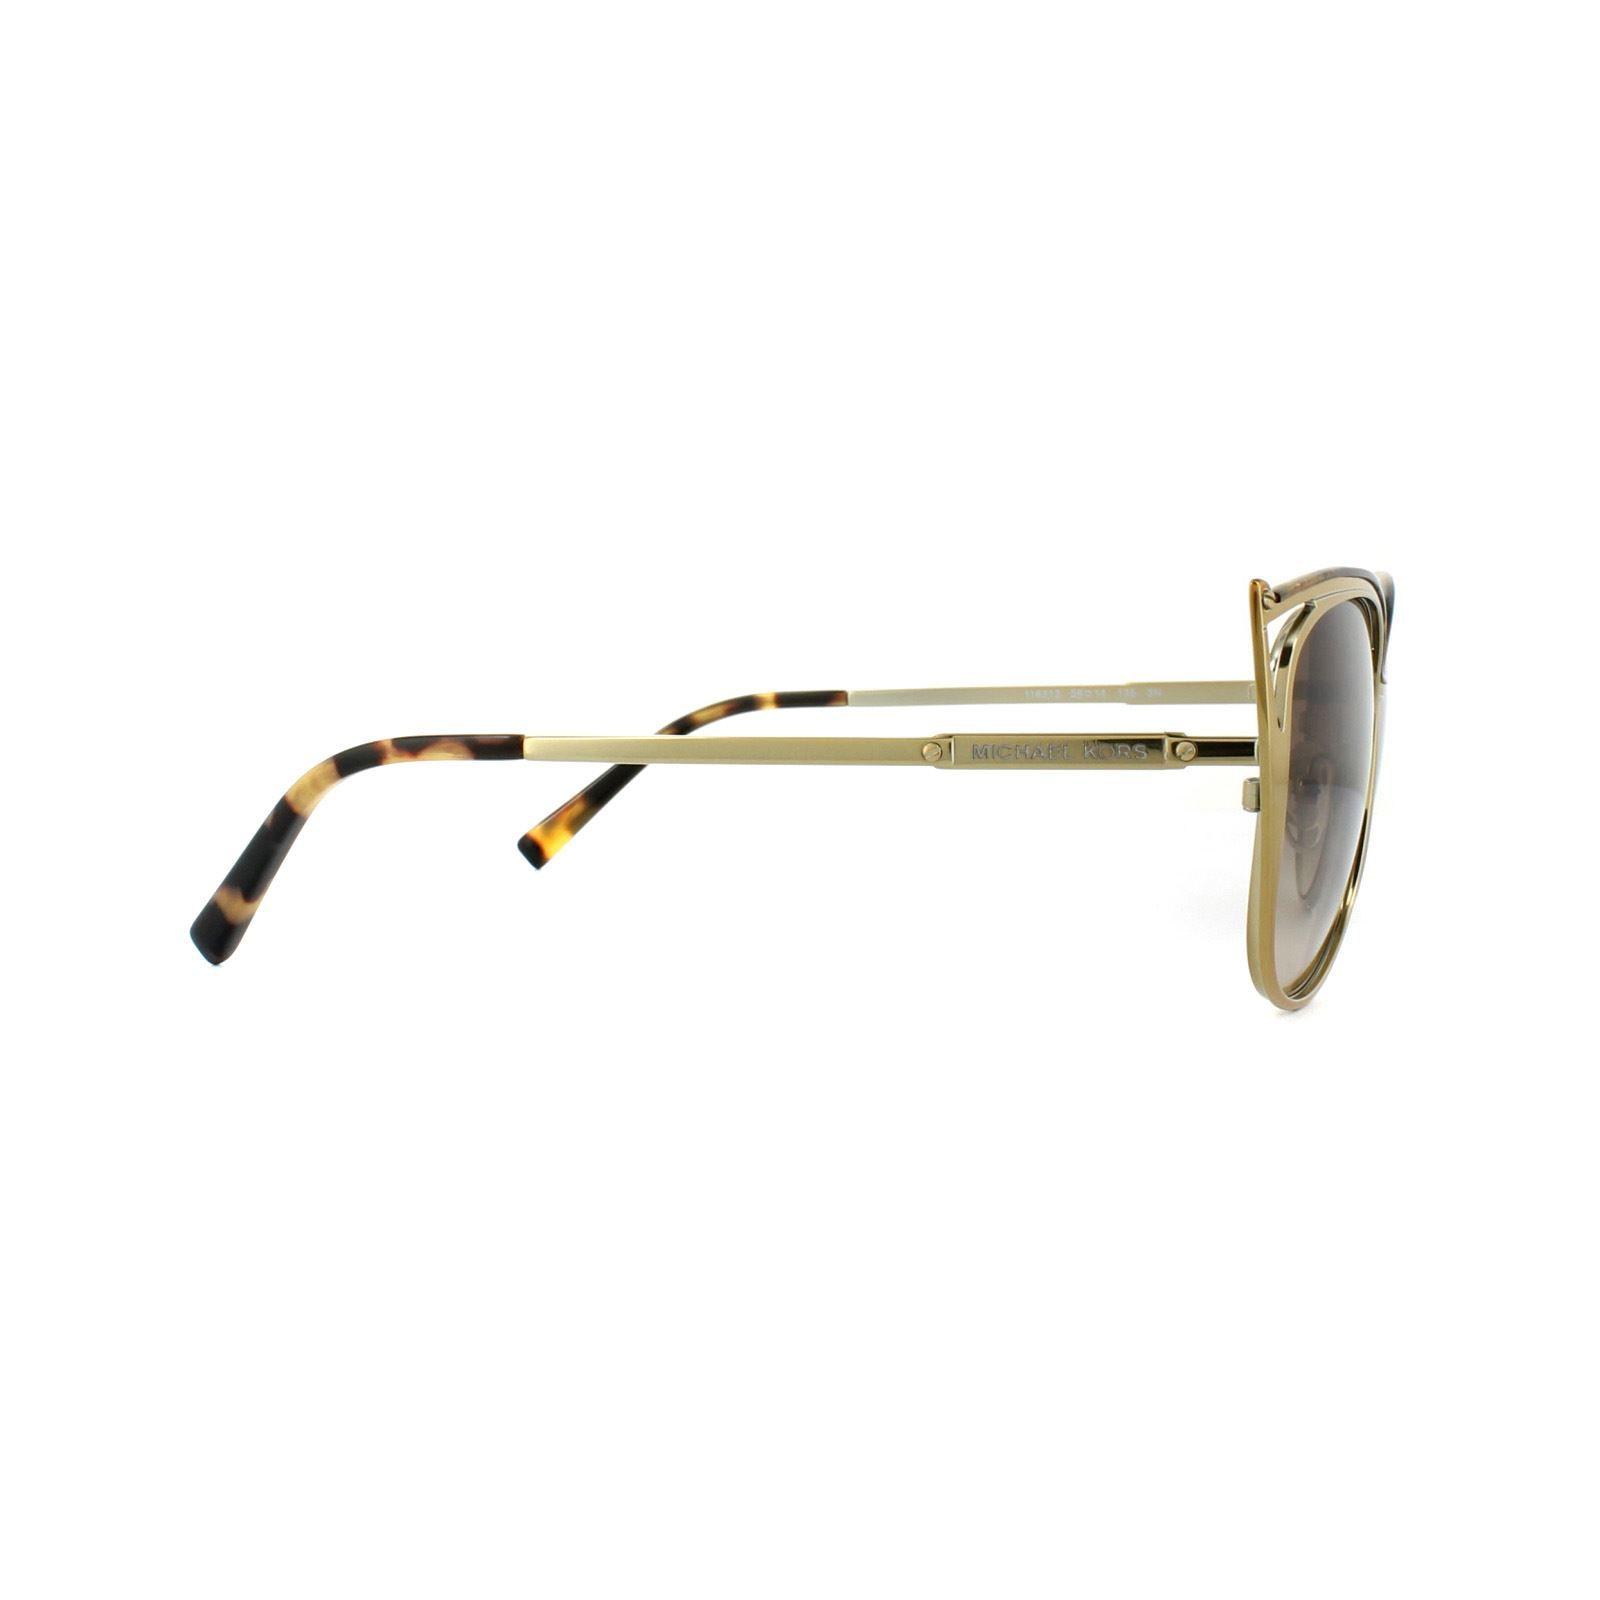 Michael Kors Sunglasses Ina 1020 1163/13 Light Gold Brown Gradient